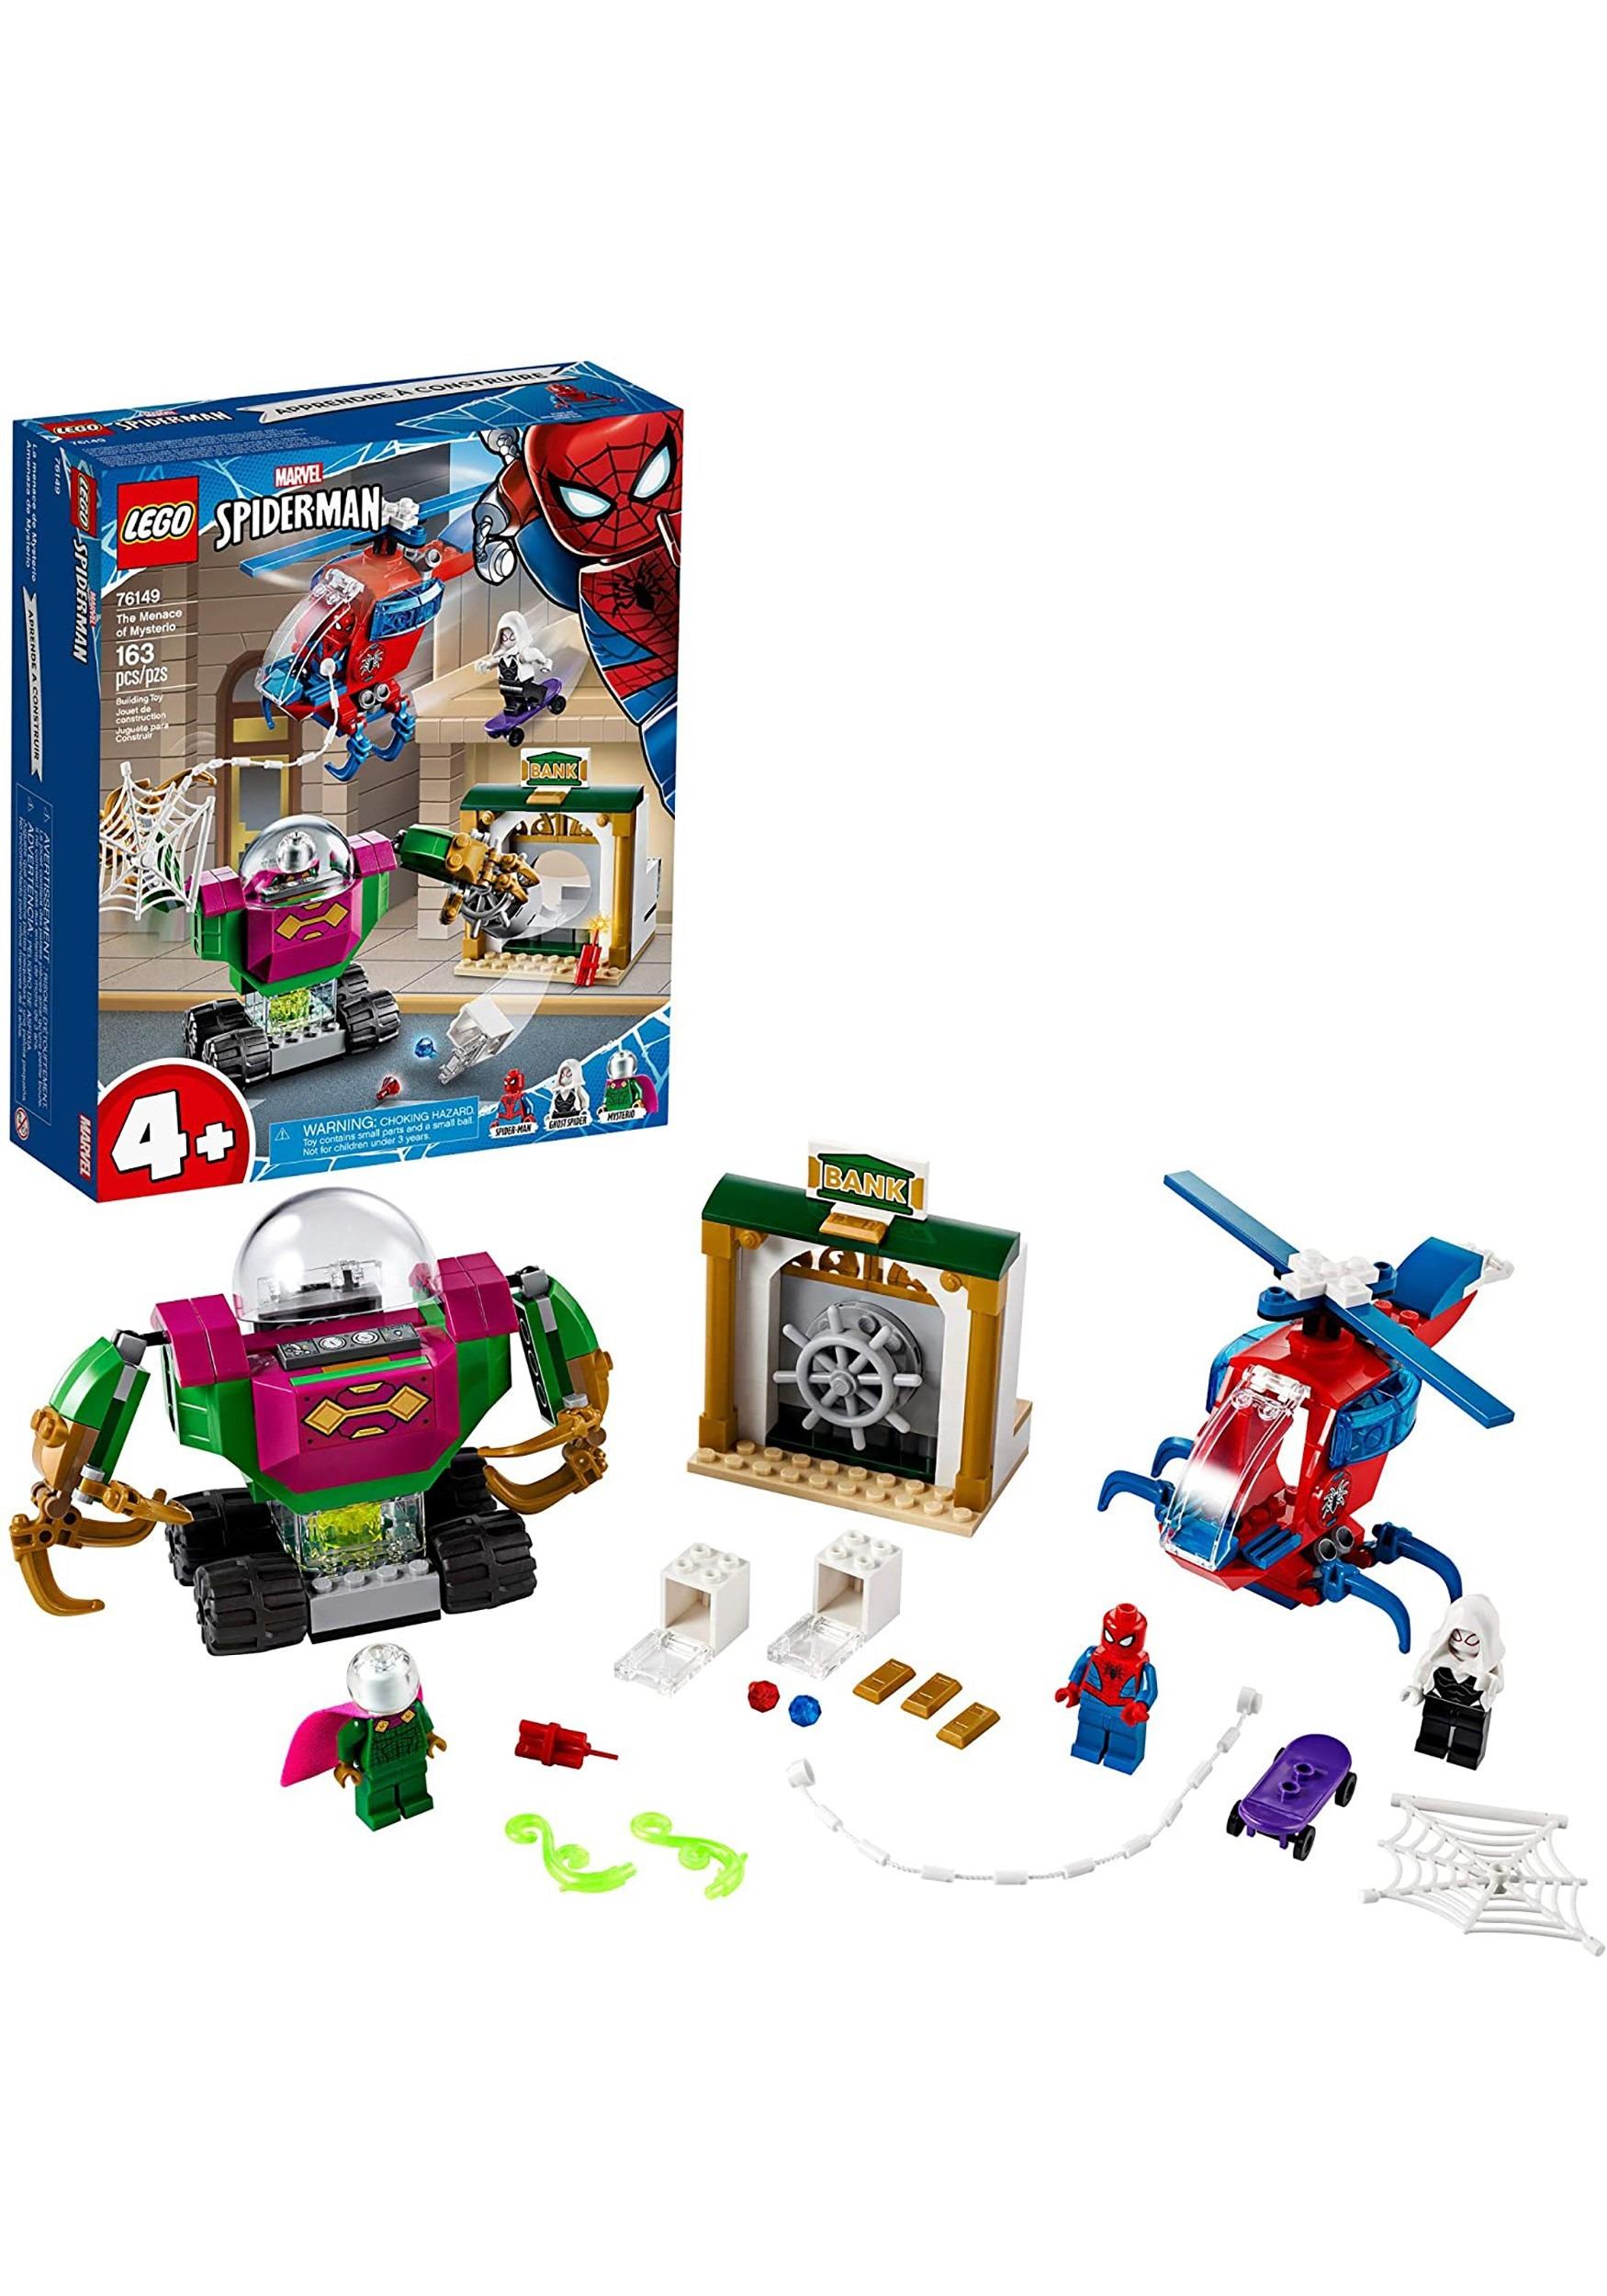 Marvel LEGO Spider-Man The Menace of Mysterio Building Set